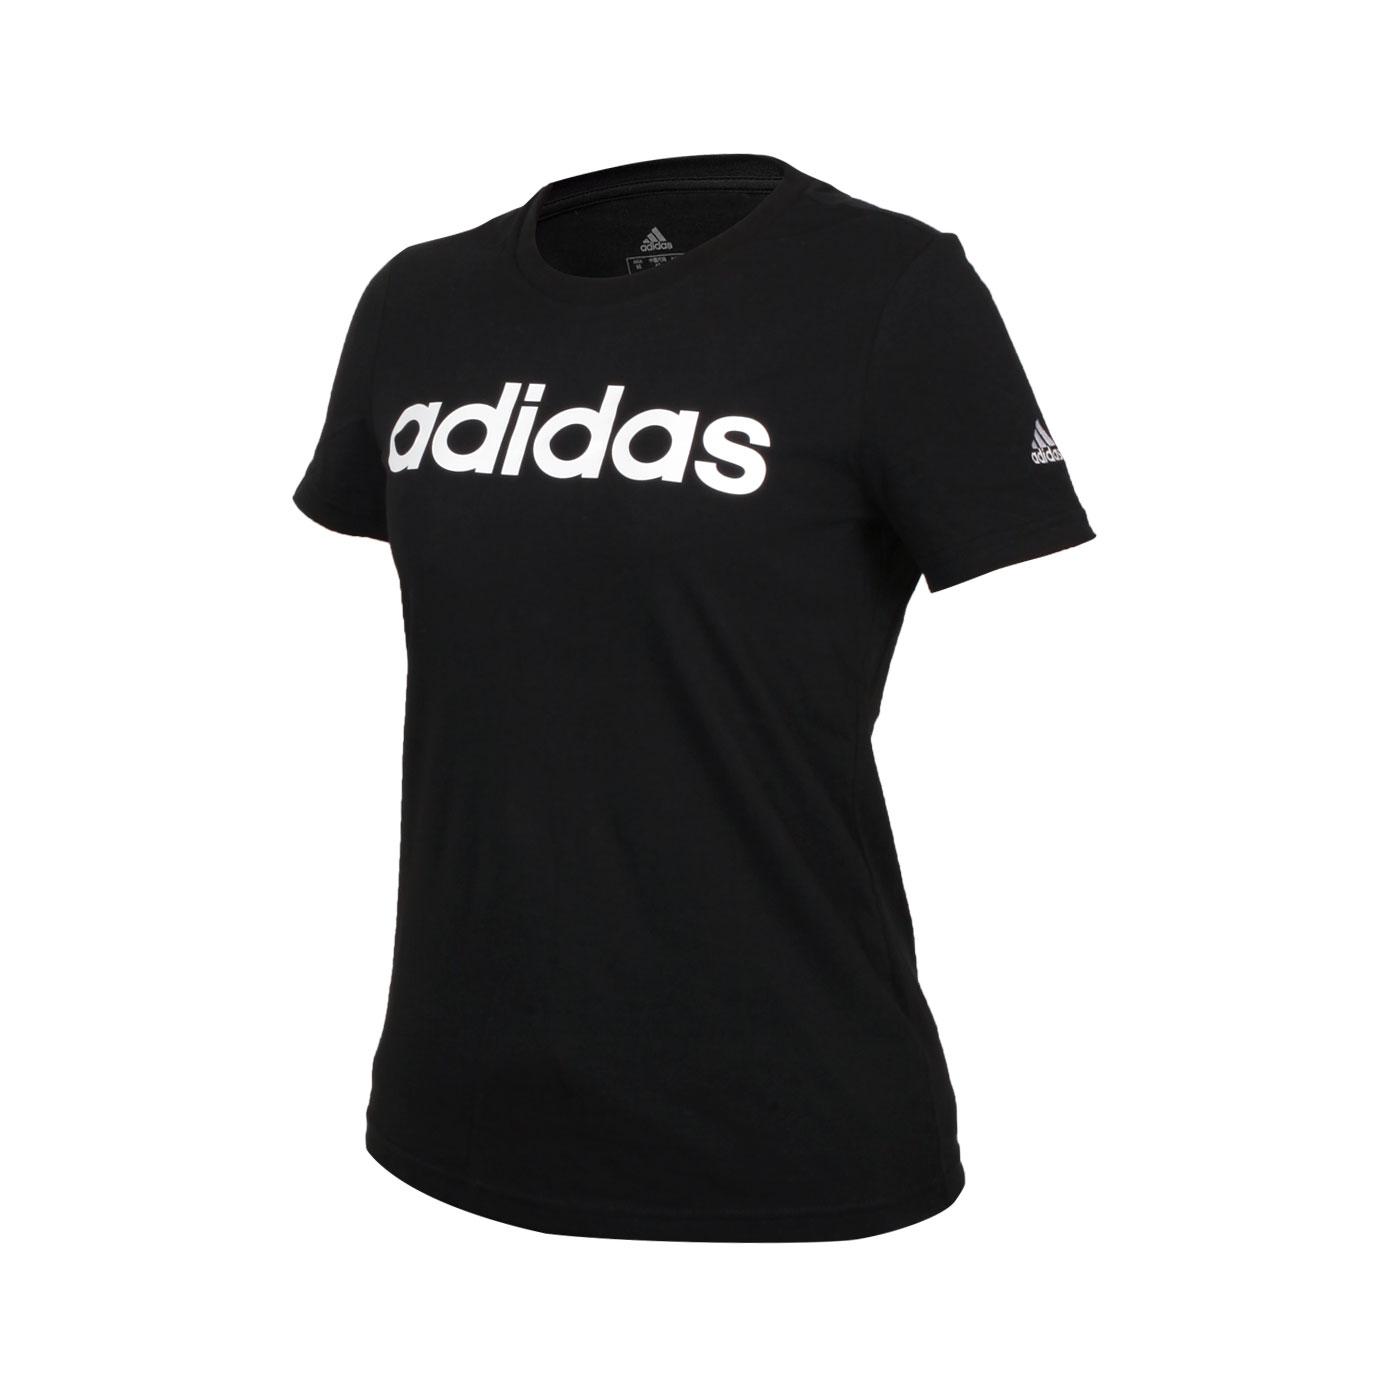 ADIDAS 女款短袖T恤 GL0769 - 黑白